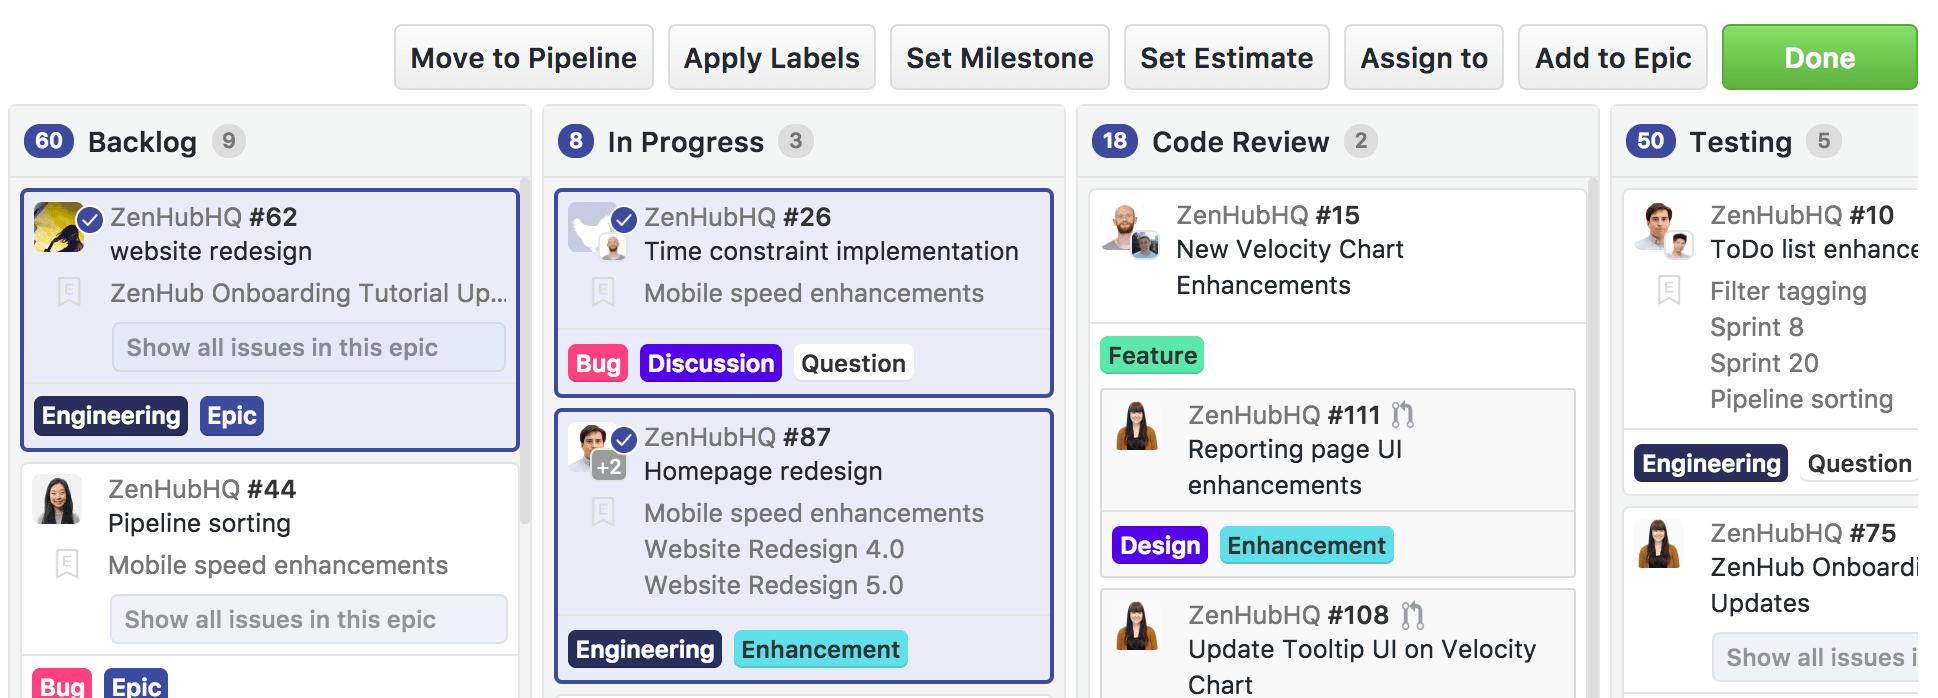 zenhub-board-multi-action-bar